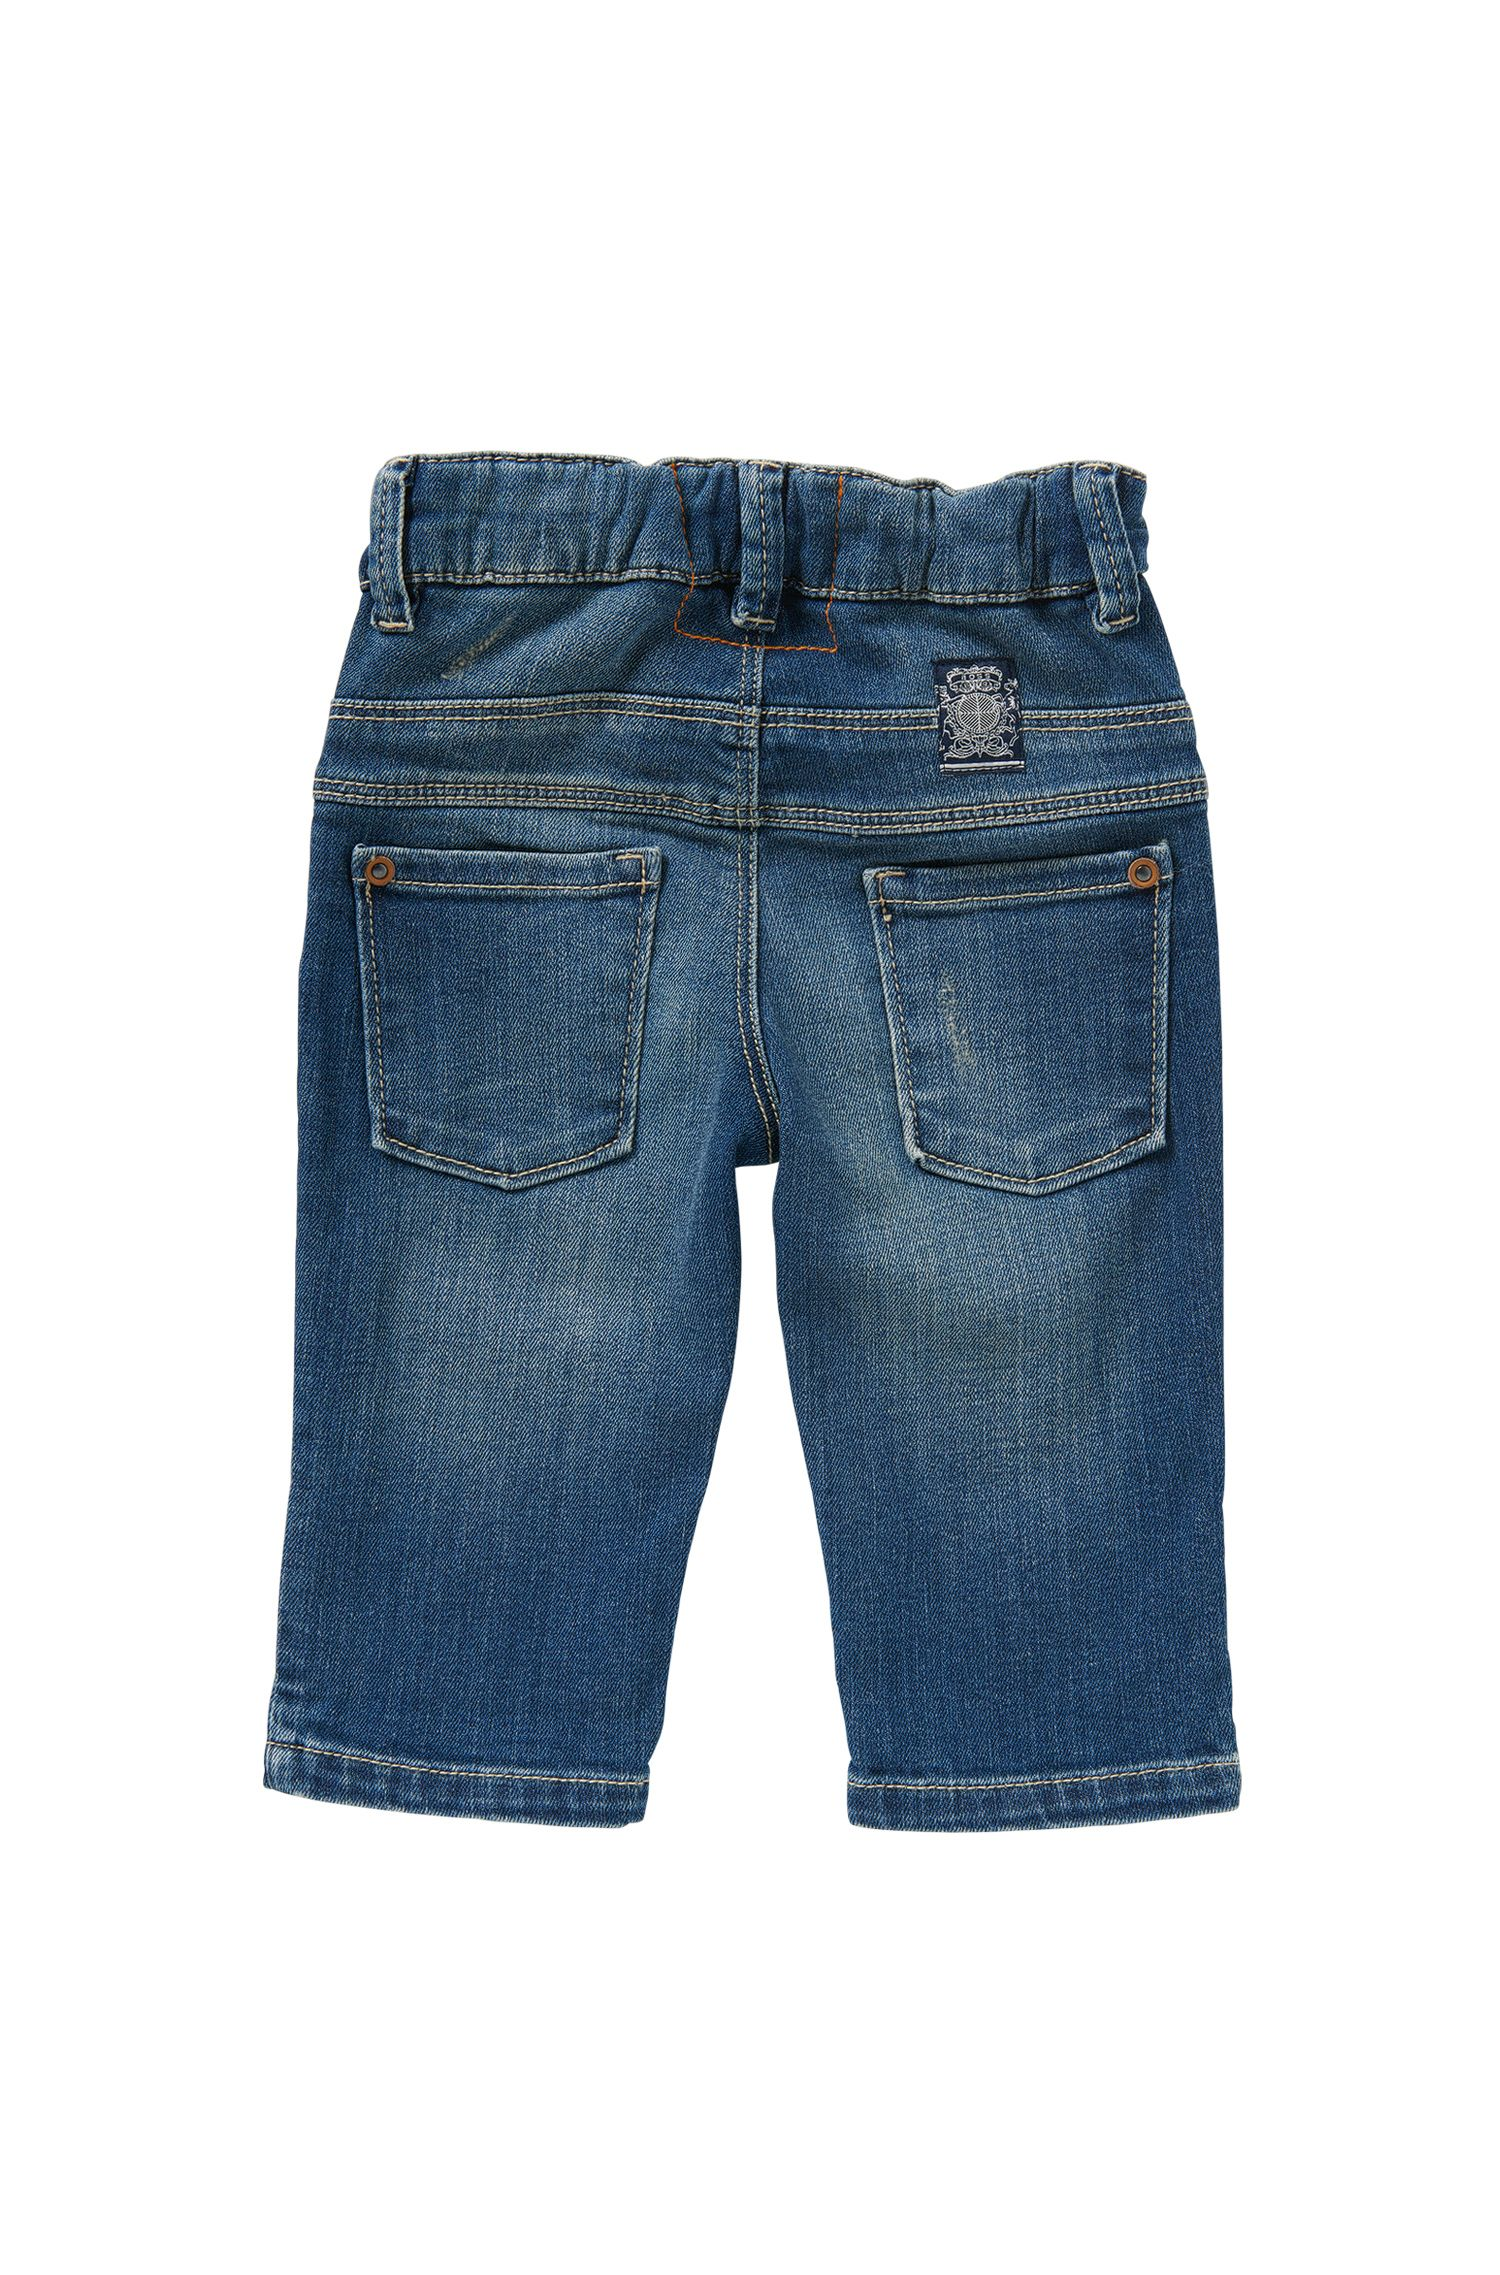 Slim-Fit Baby-Jeans aus Stretch-Baumwolle: 'Montana'